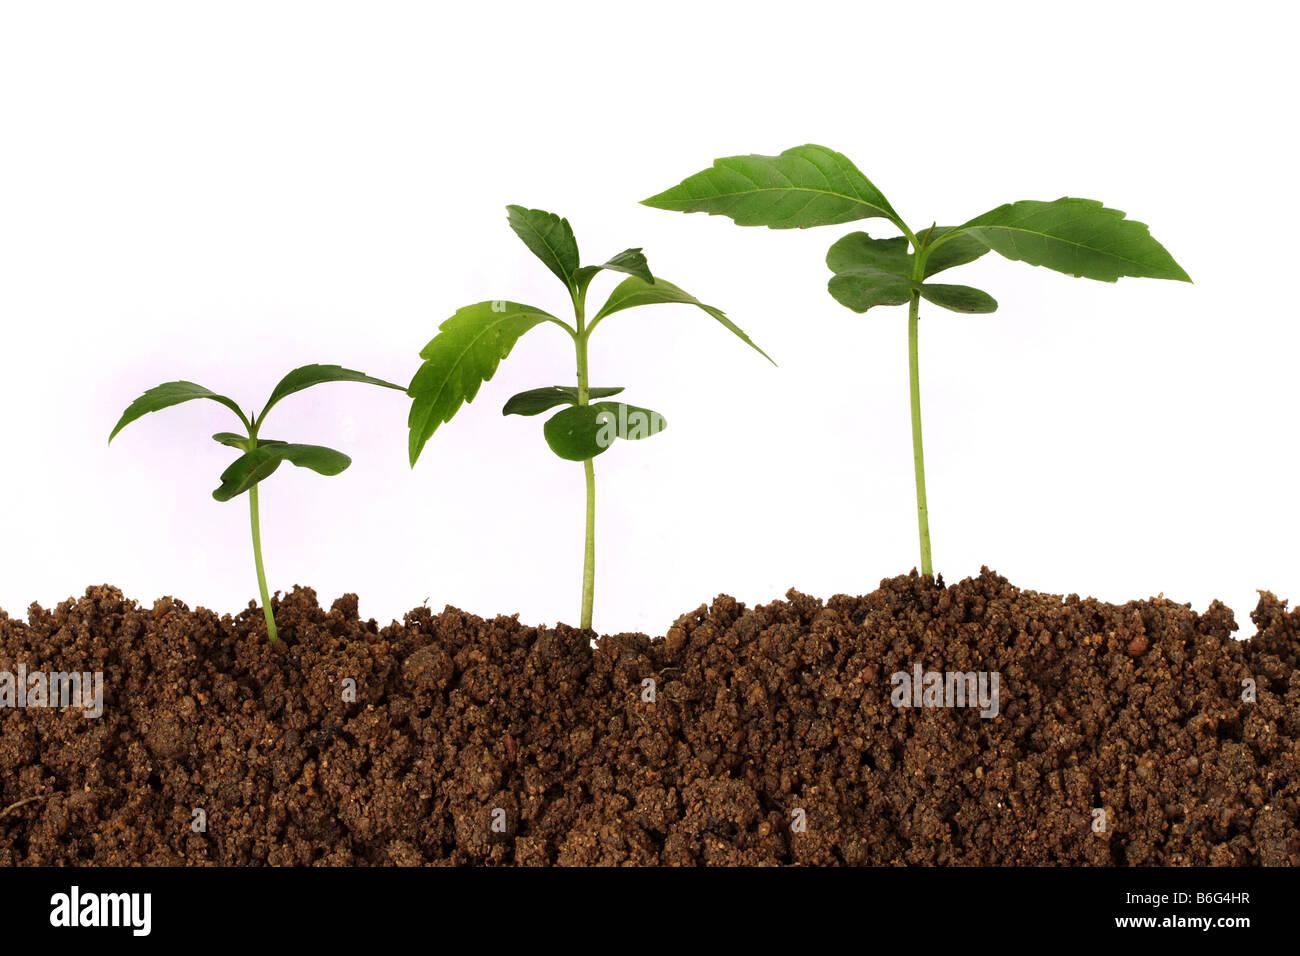 Three saplings growing from soil Stock Photo